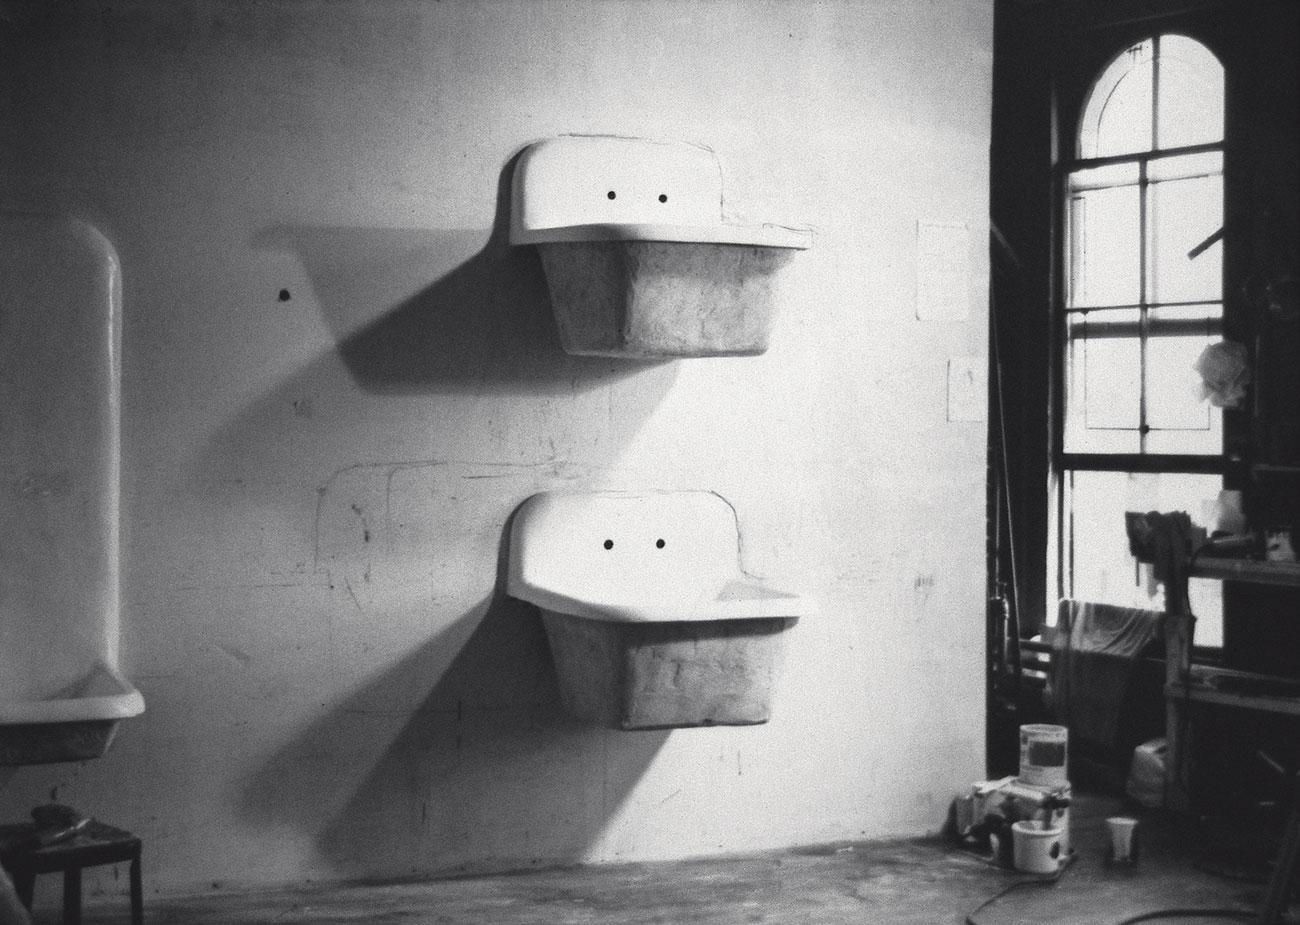 Sink Enamel Paint Robert Gober The Ascending Sink Art Blart